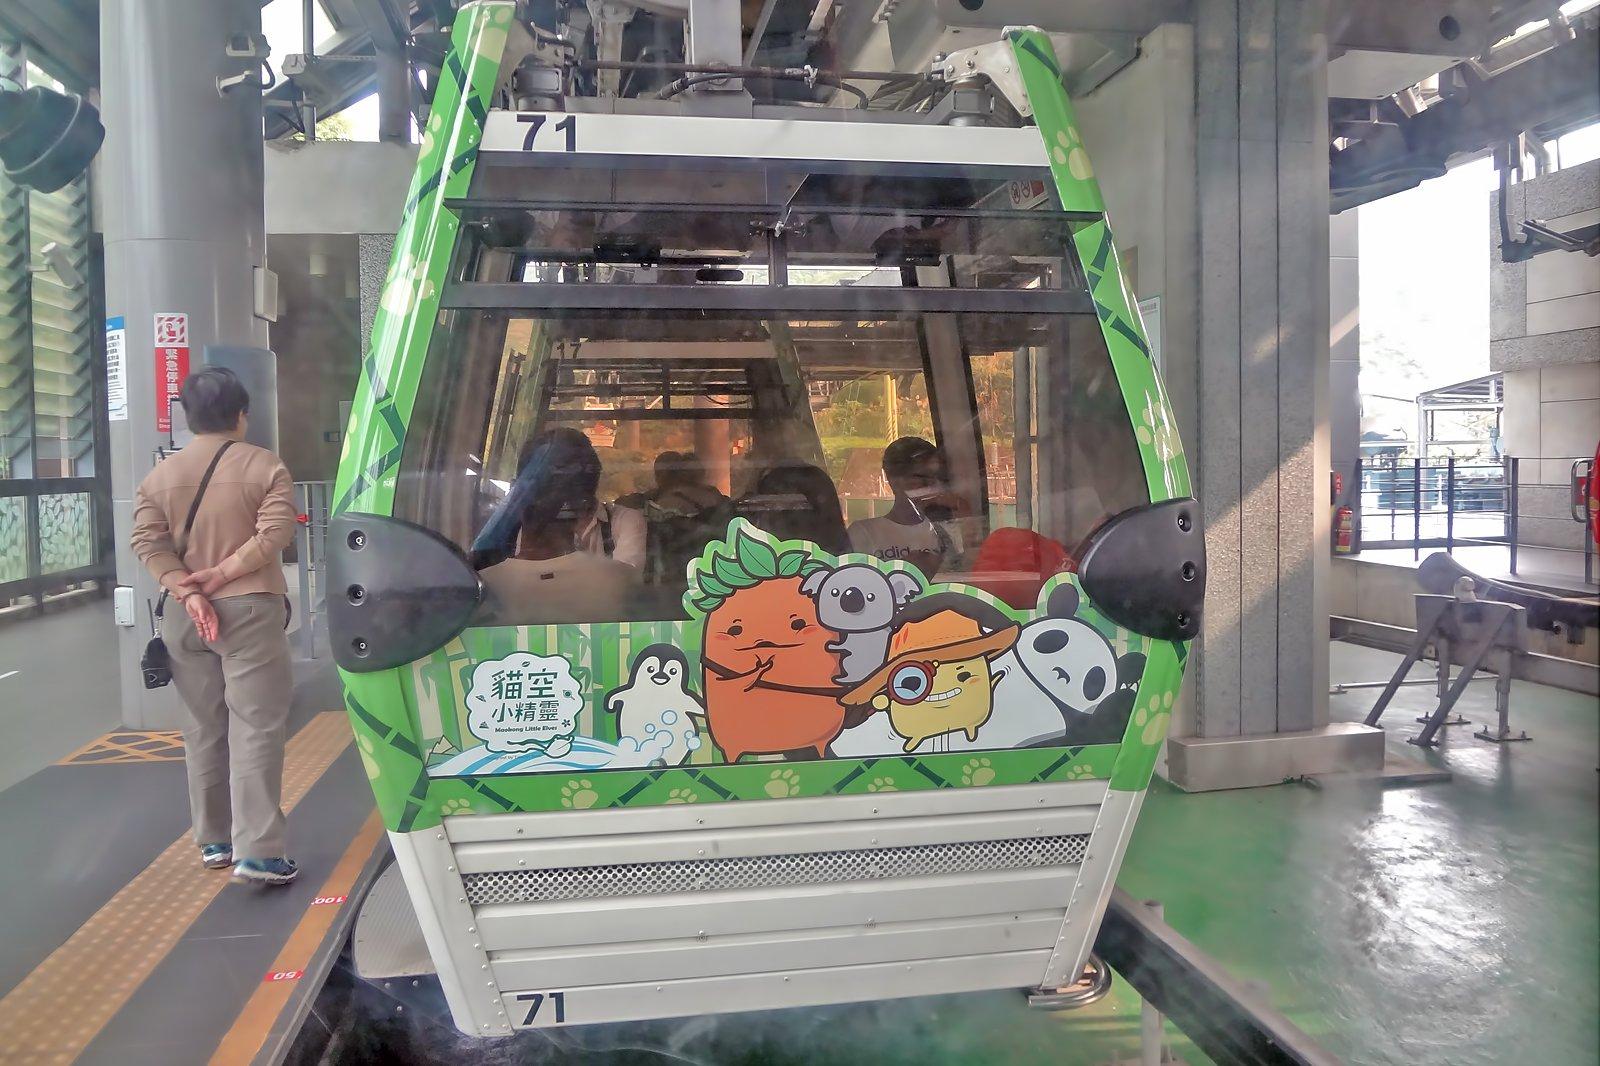 Maokong Gondola - Popular Attraction in Wenshan District